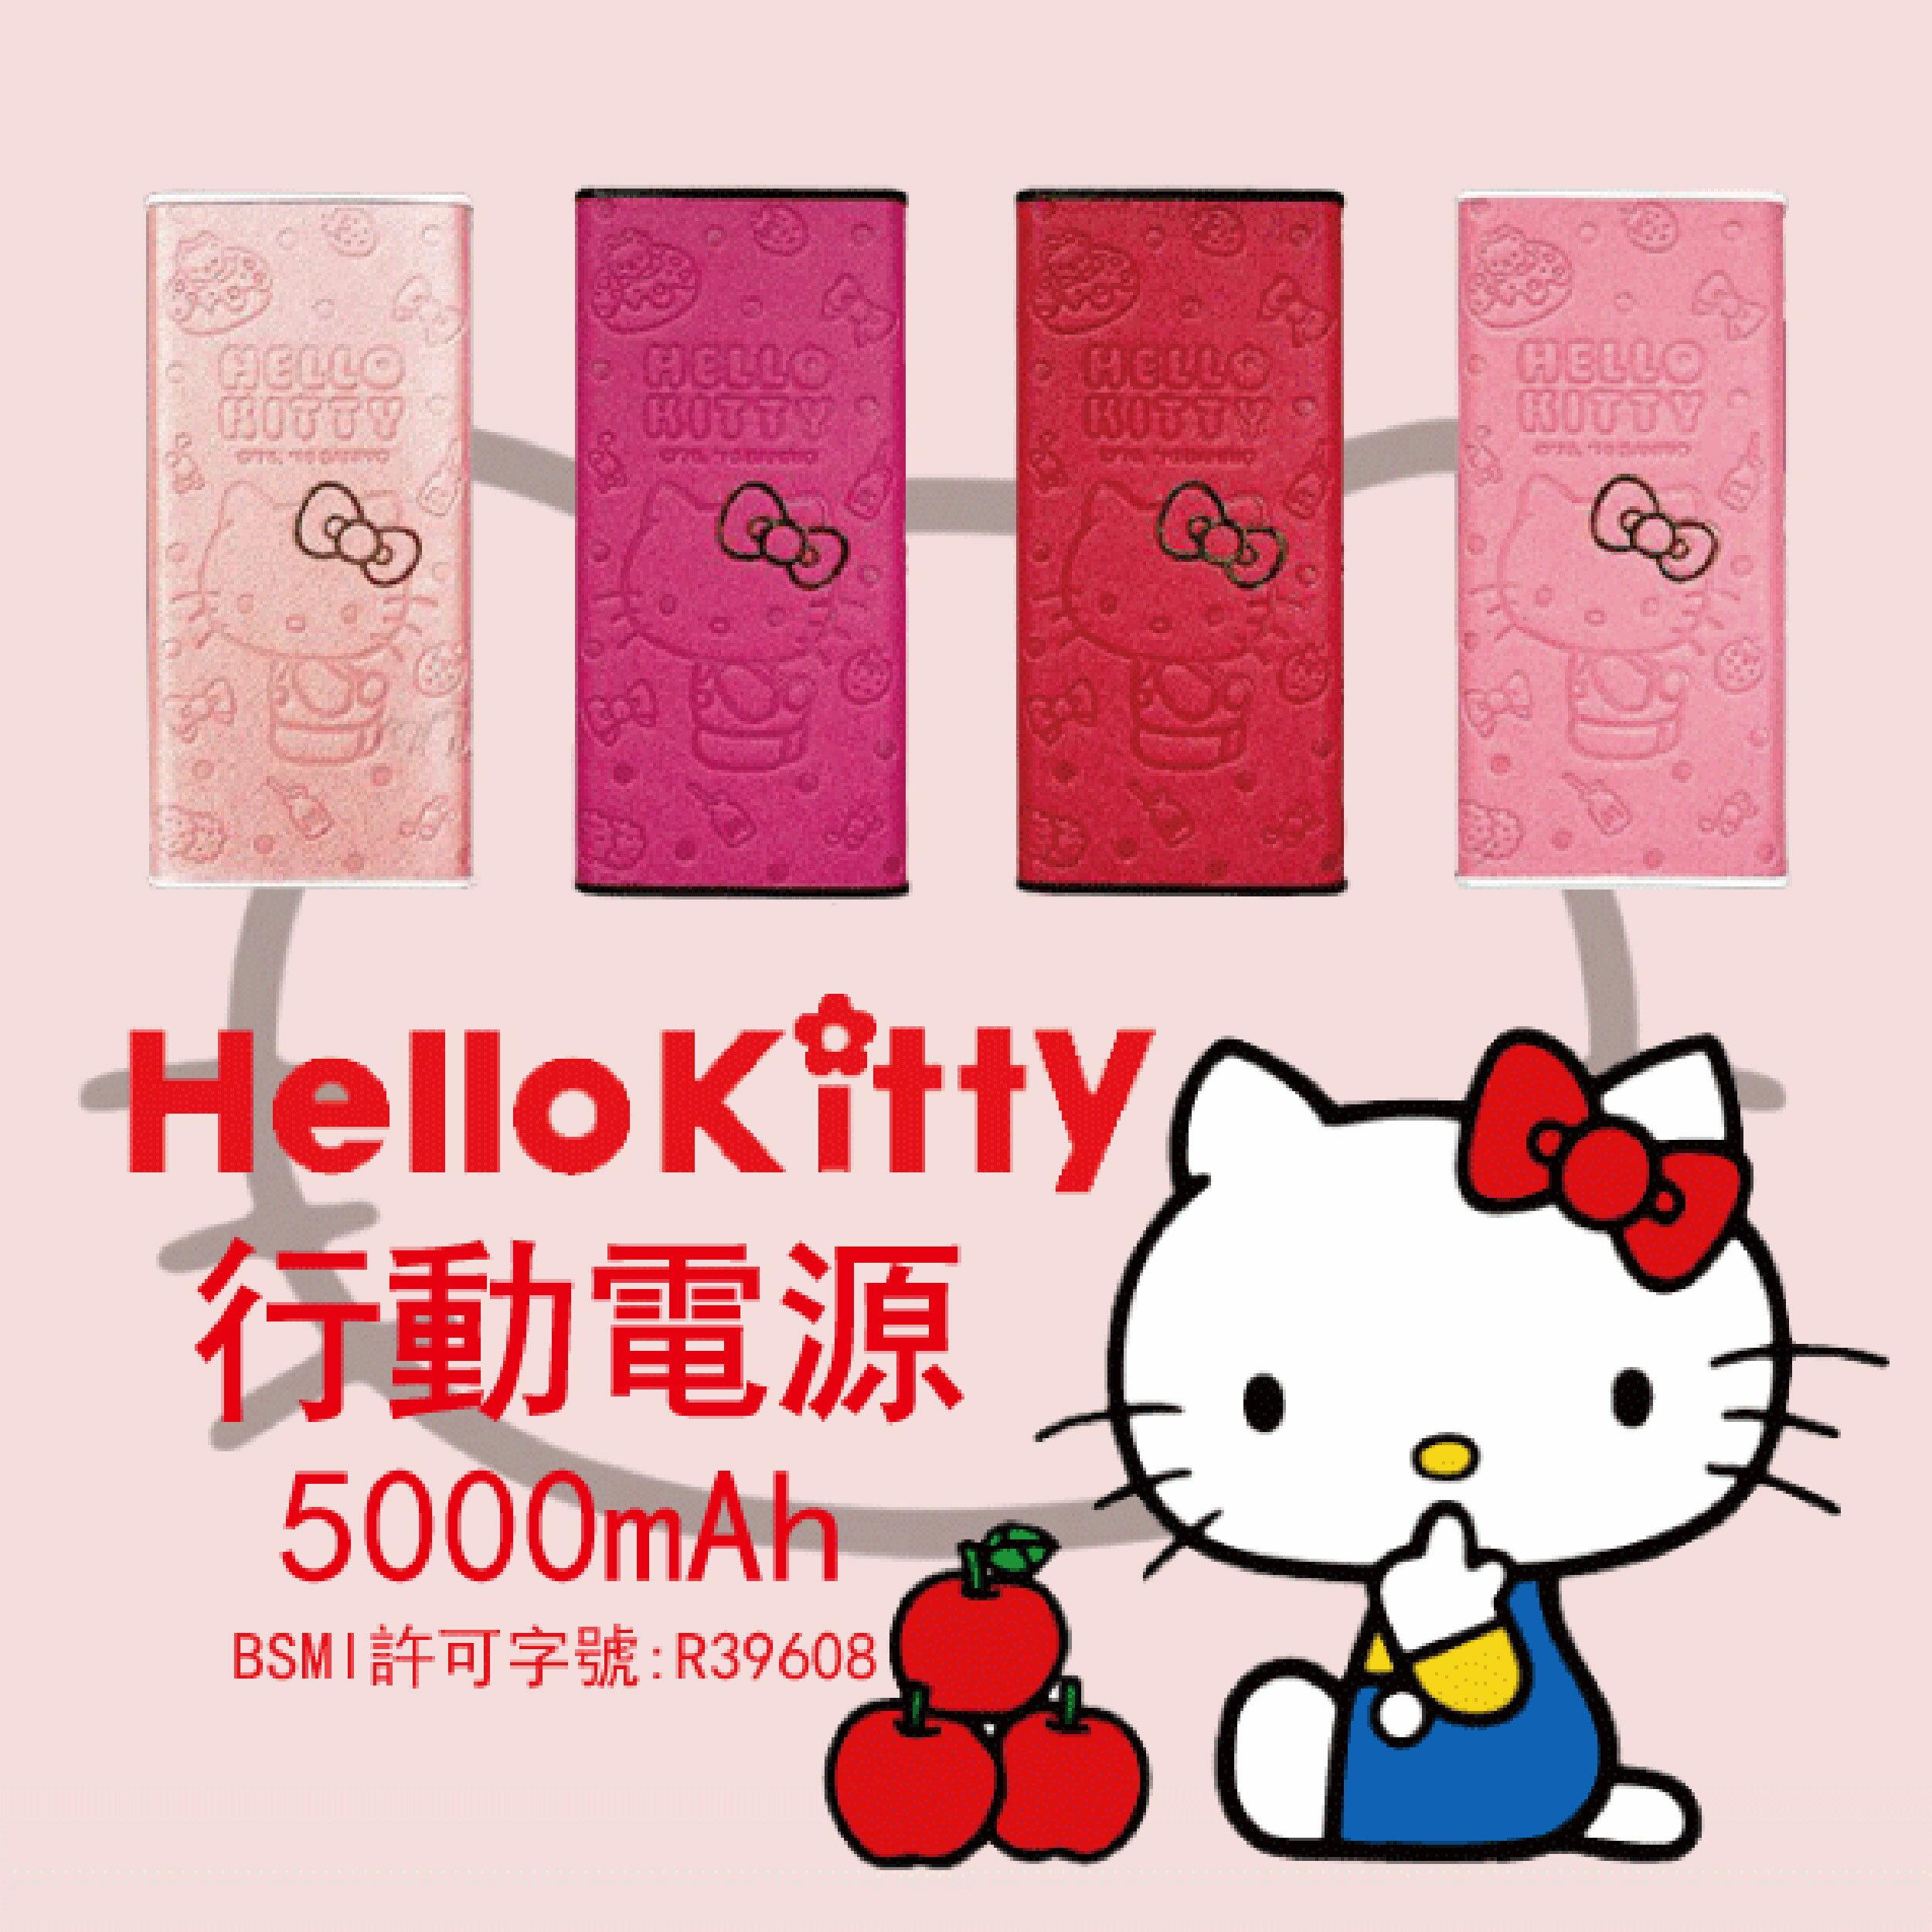 Hello Kitty 行動電源 5000mAh 三麗鷗正版 2A 移動電源 寶可夢必備